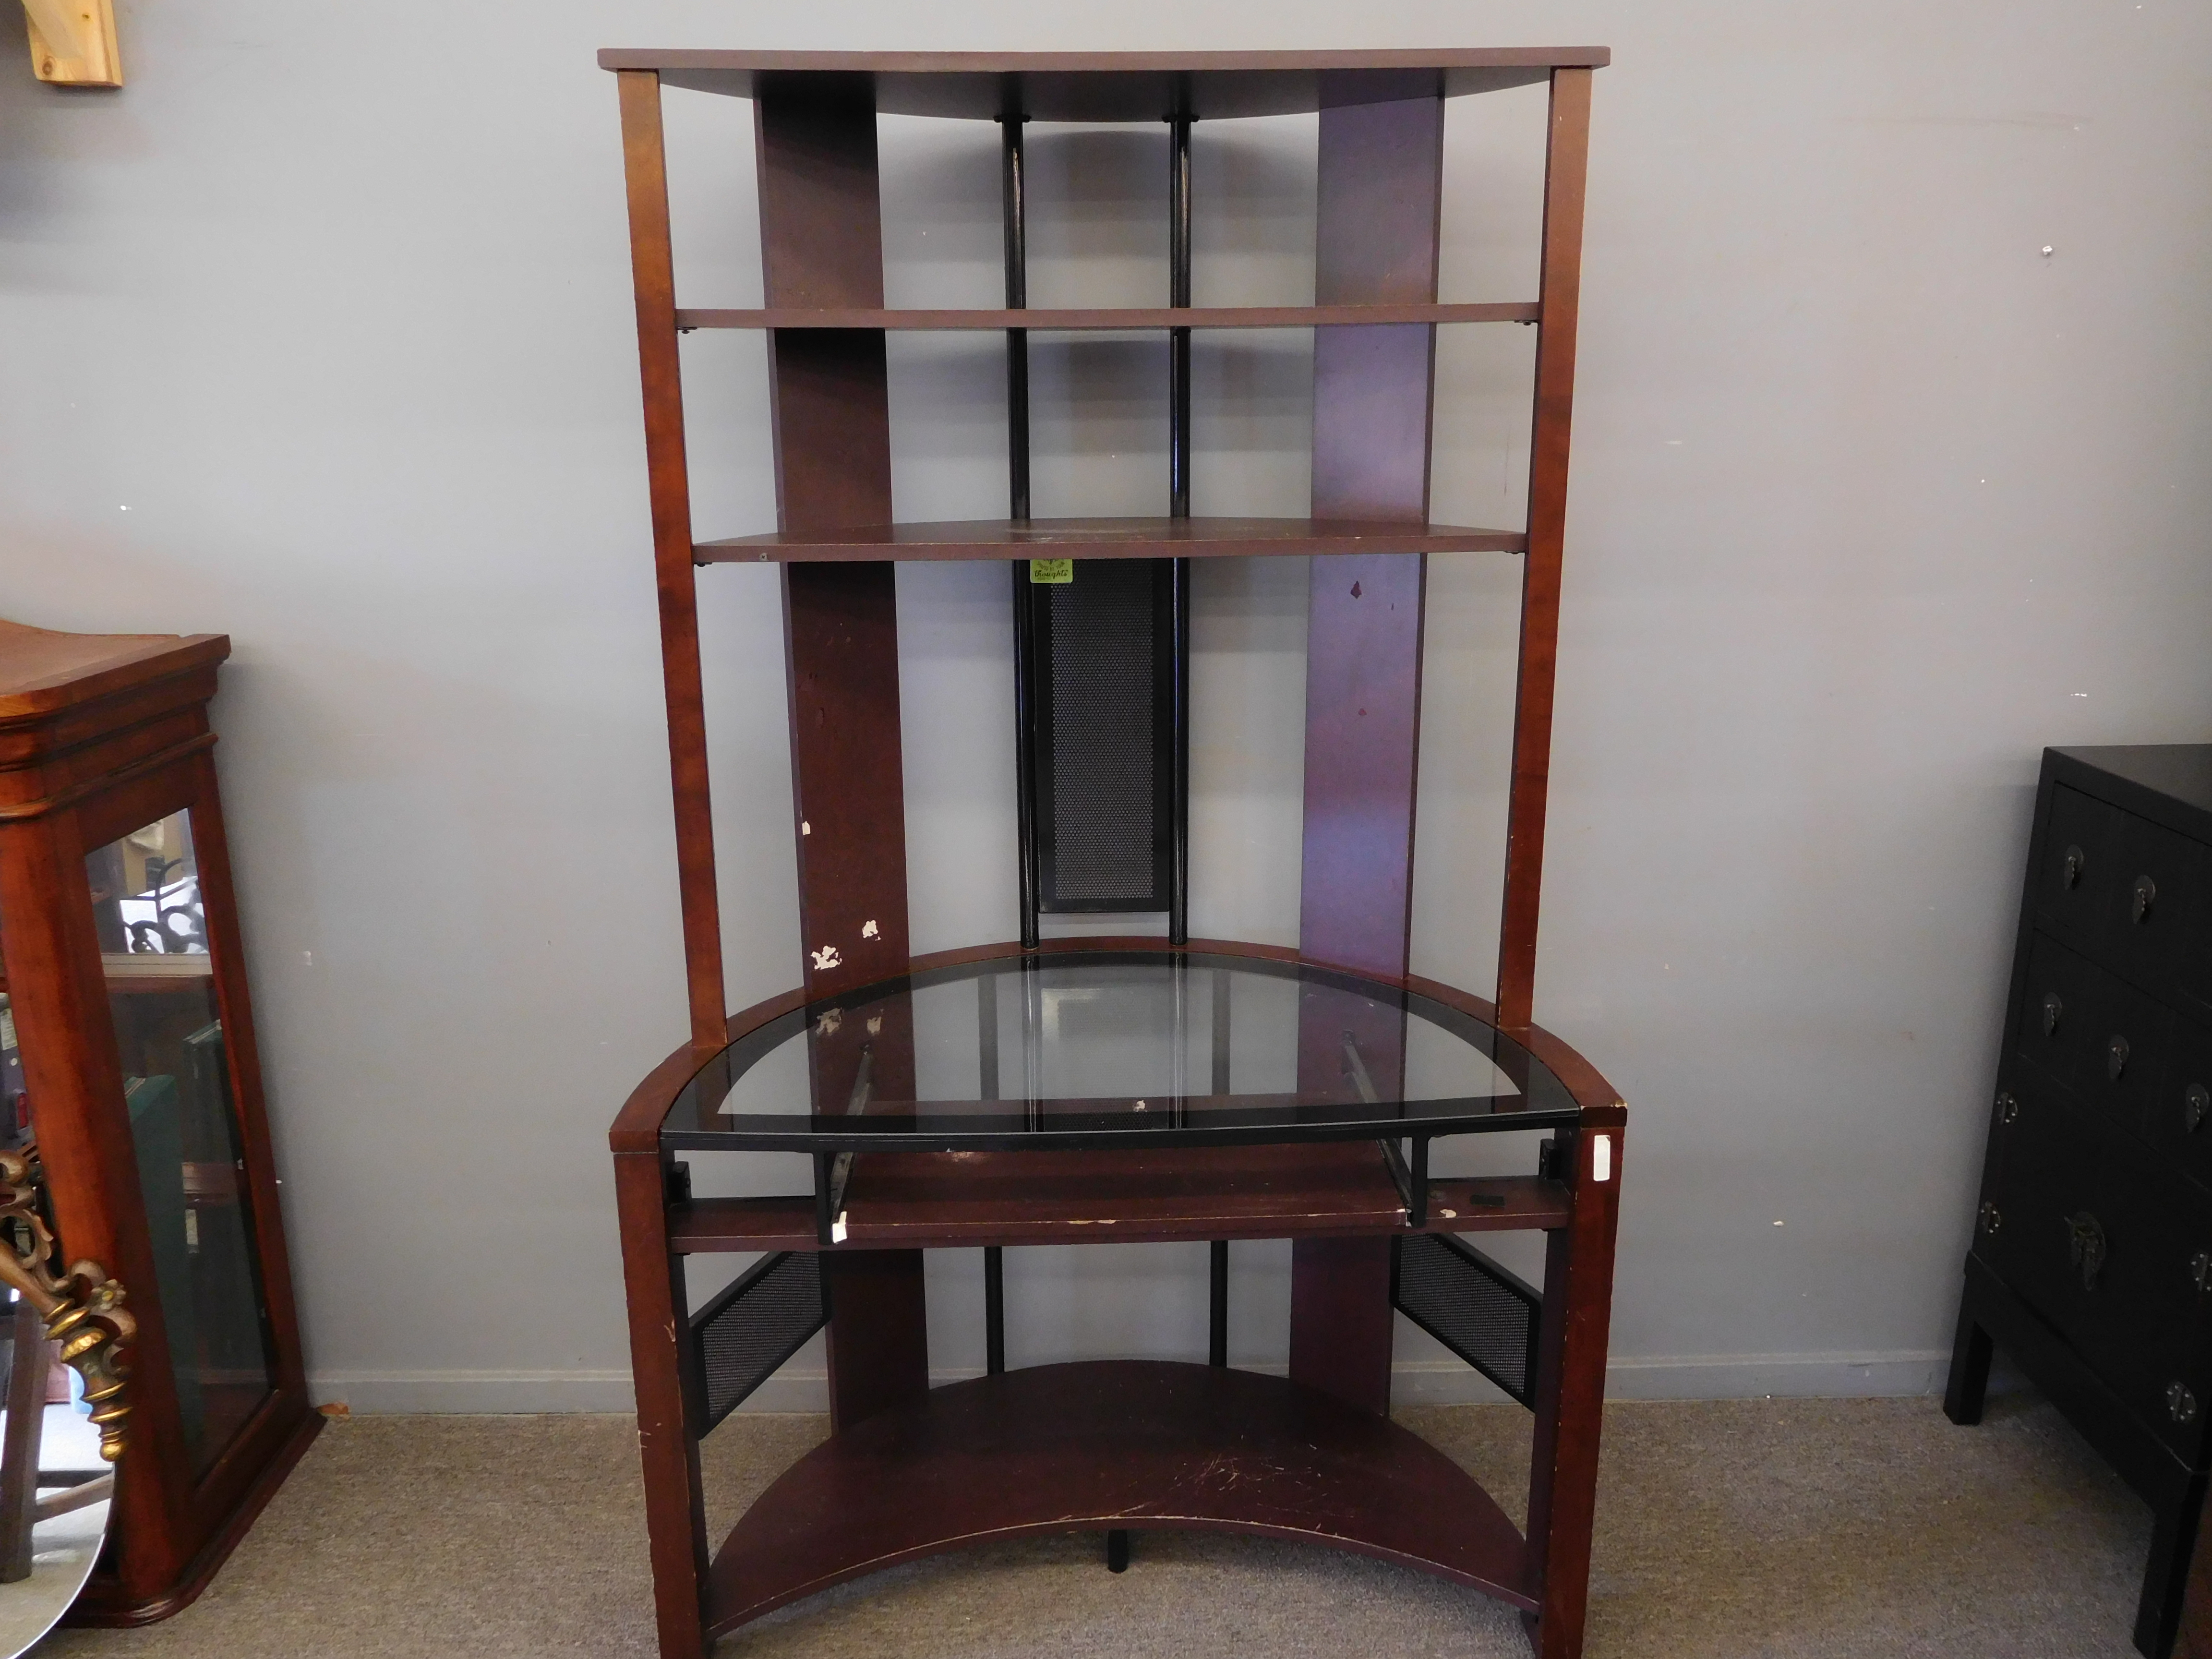 Modern Glass Top Computer Desk with Half Moon Shelves